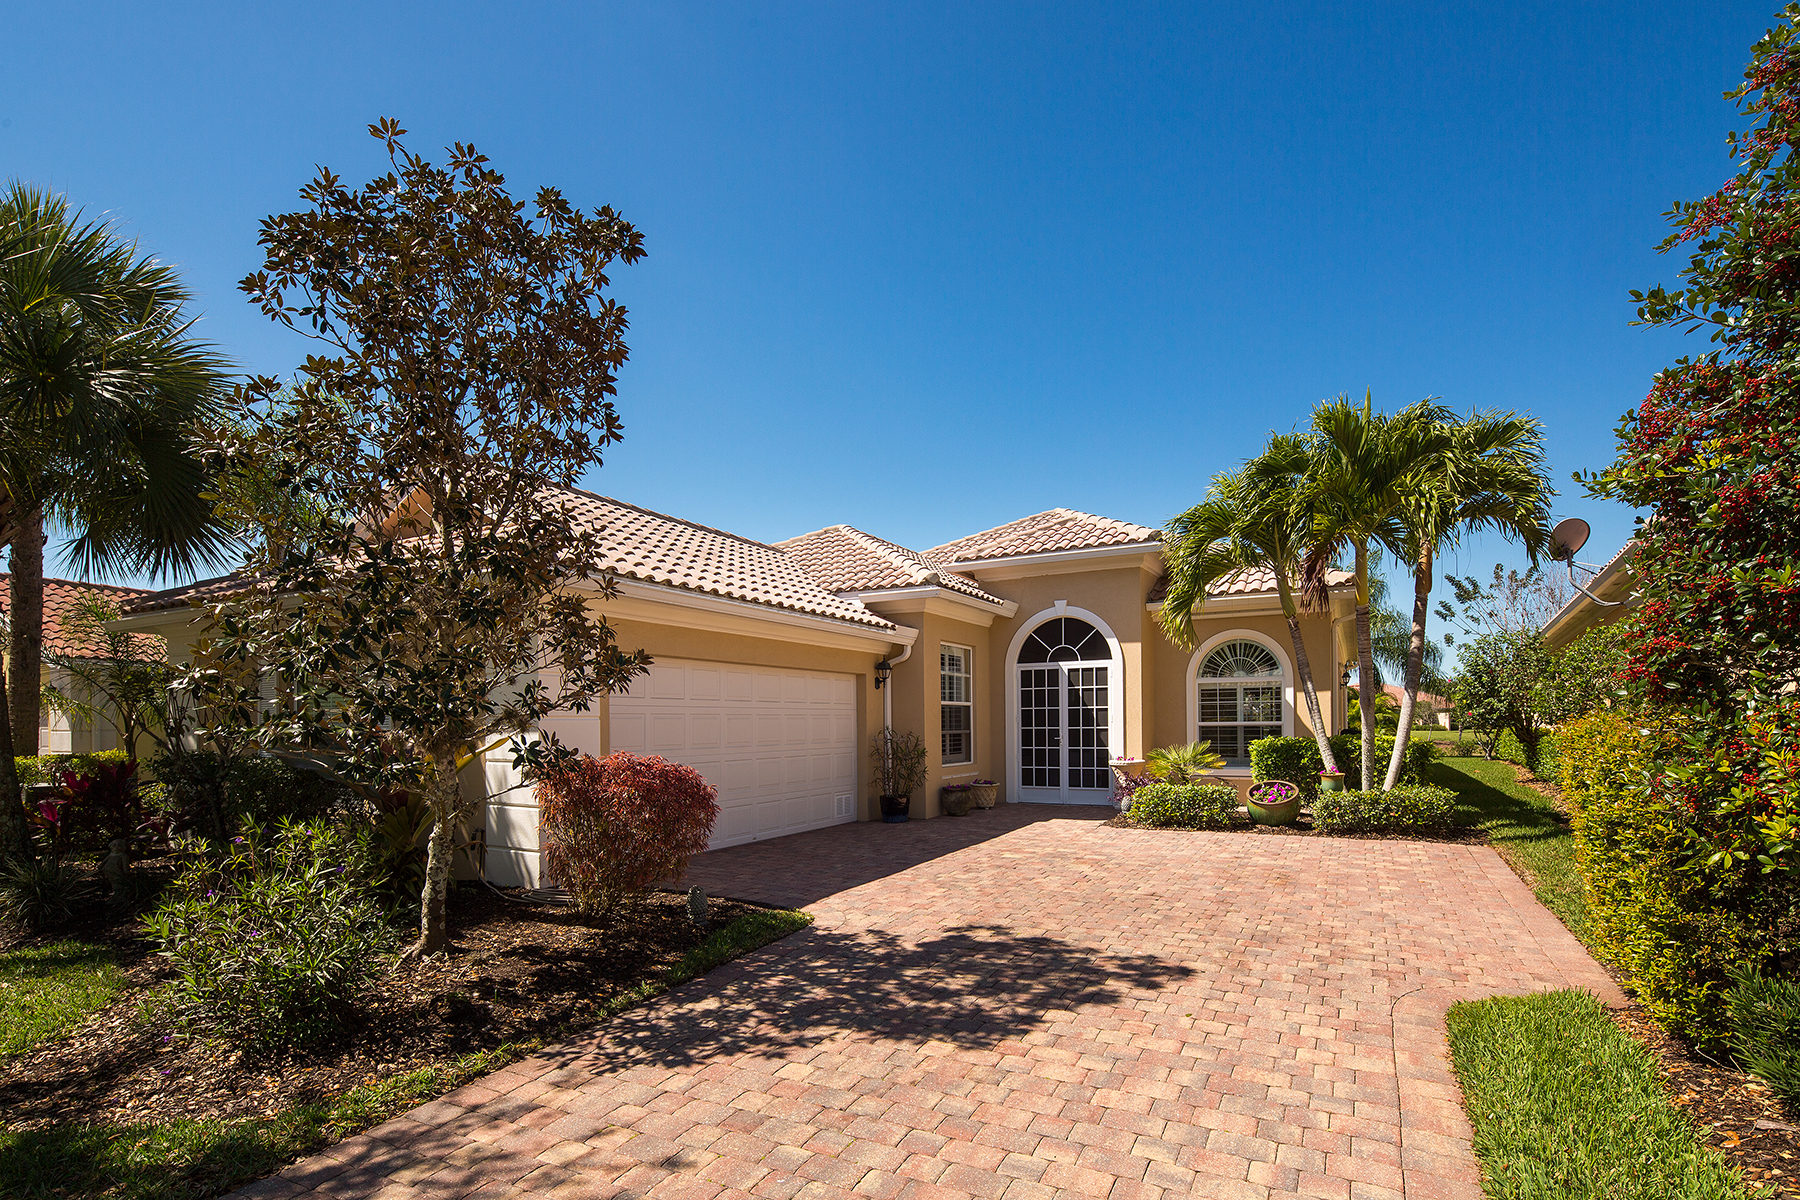 Single Family Home for Sale at VILLAGE WALK OF BONITA SPRINGS 28628 Wahoo Dr, Bonita Springs, Florida 34135 United States